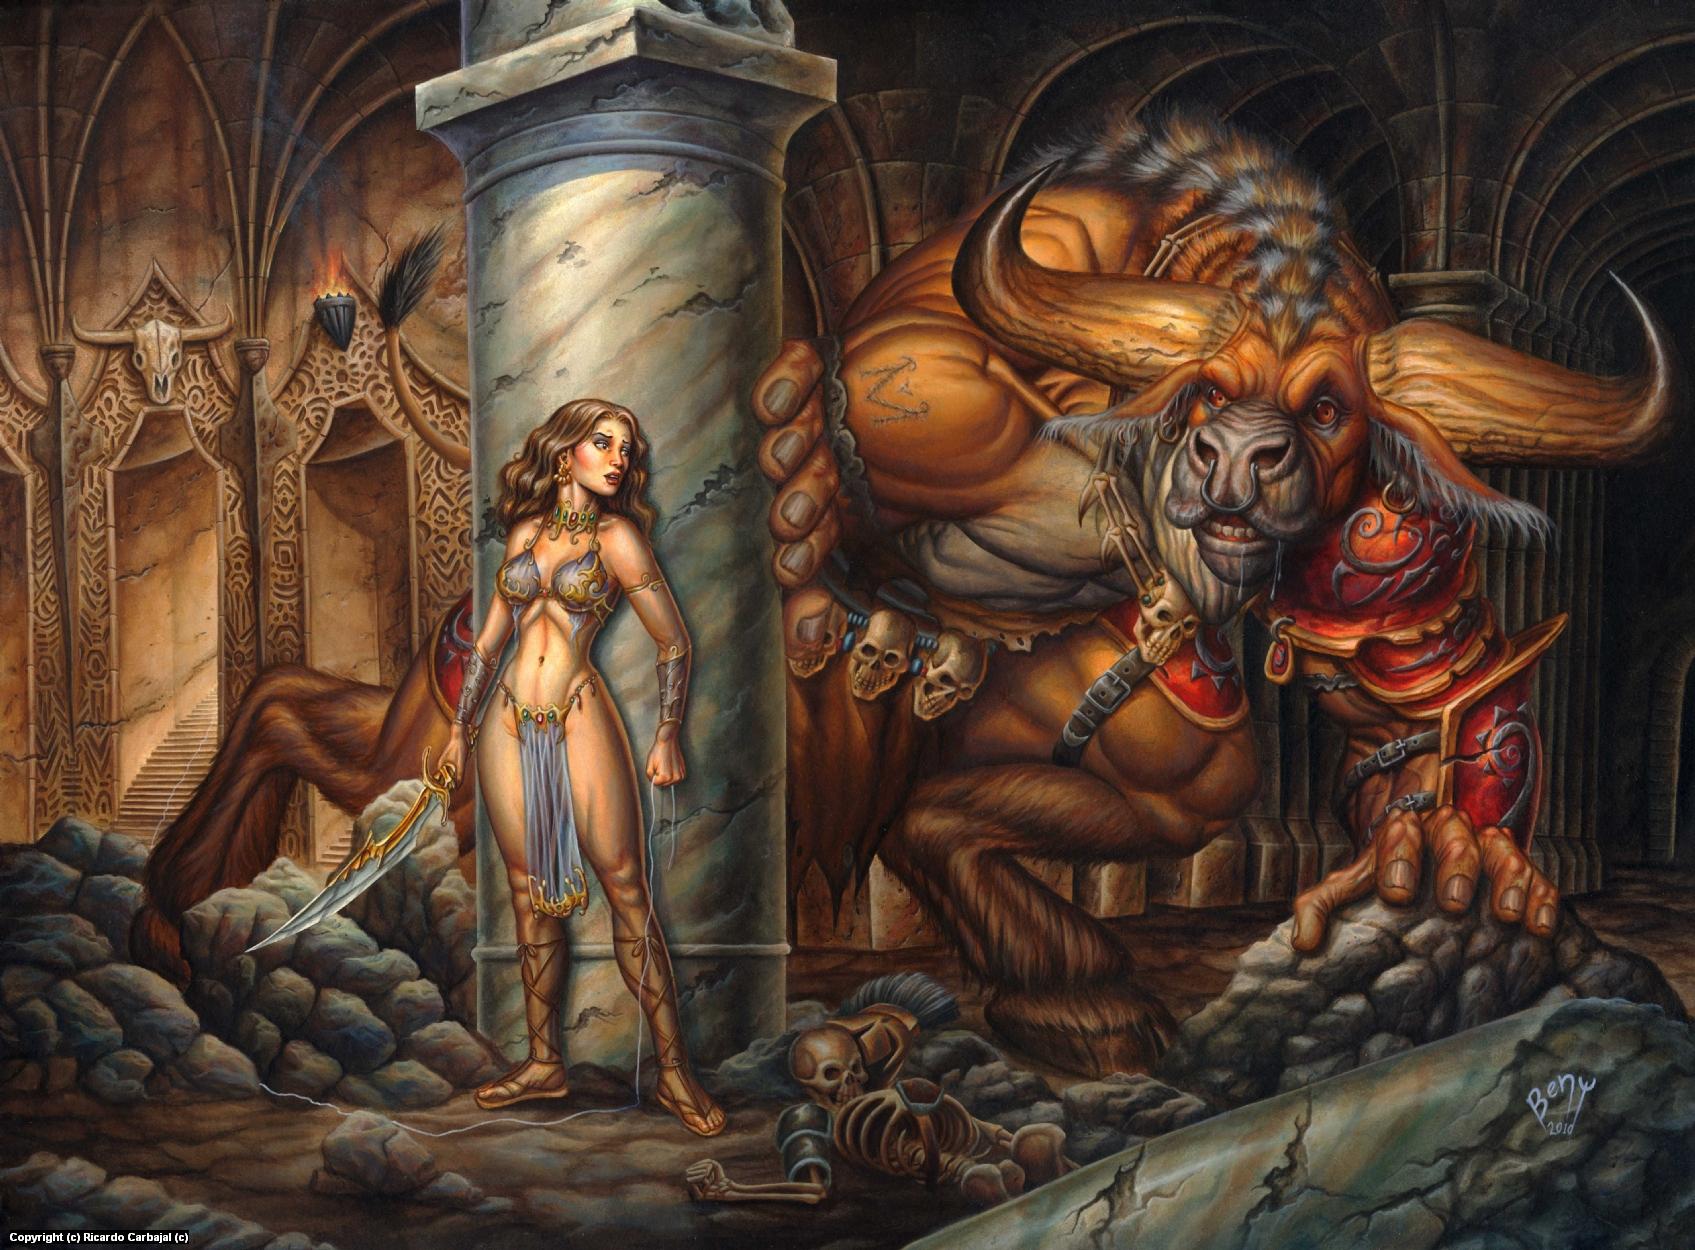 Ariadne and the Minotaur Artwork by Ricardo  Carbajal